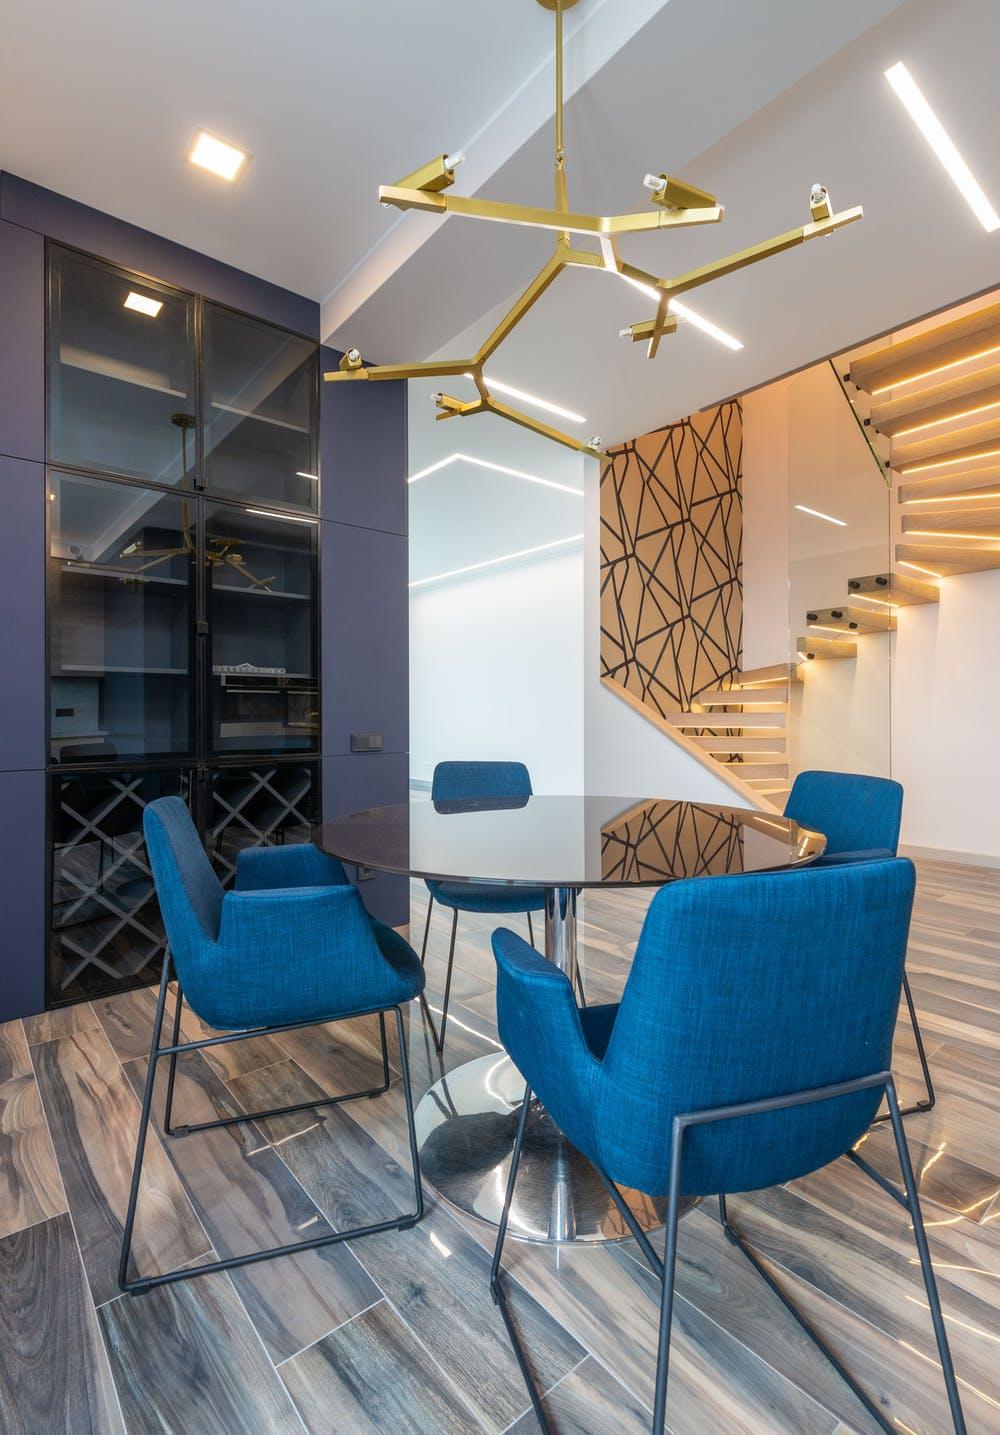 Dining room with angular style; interior decorating Brevard; Michael Gainey Signature Designs